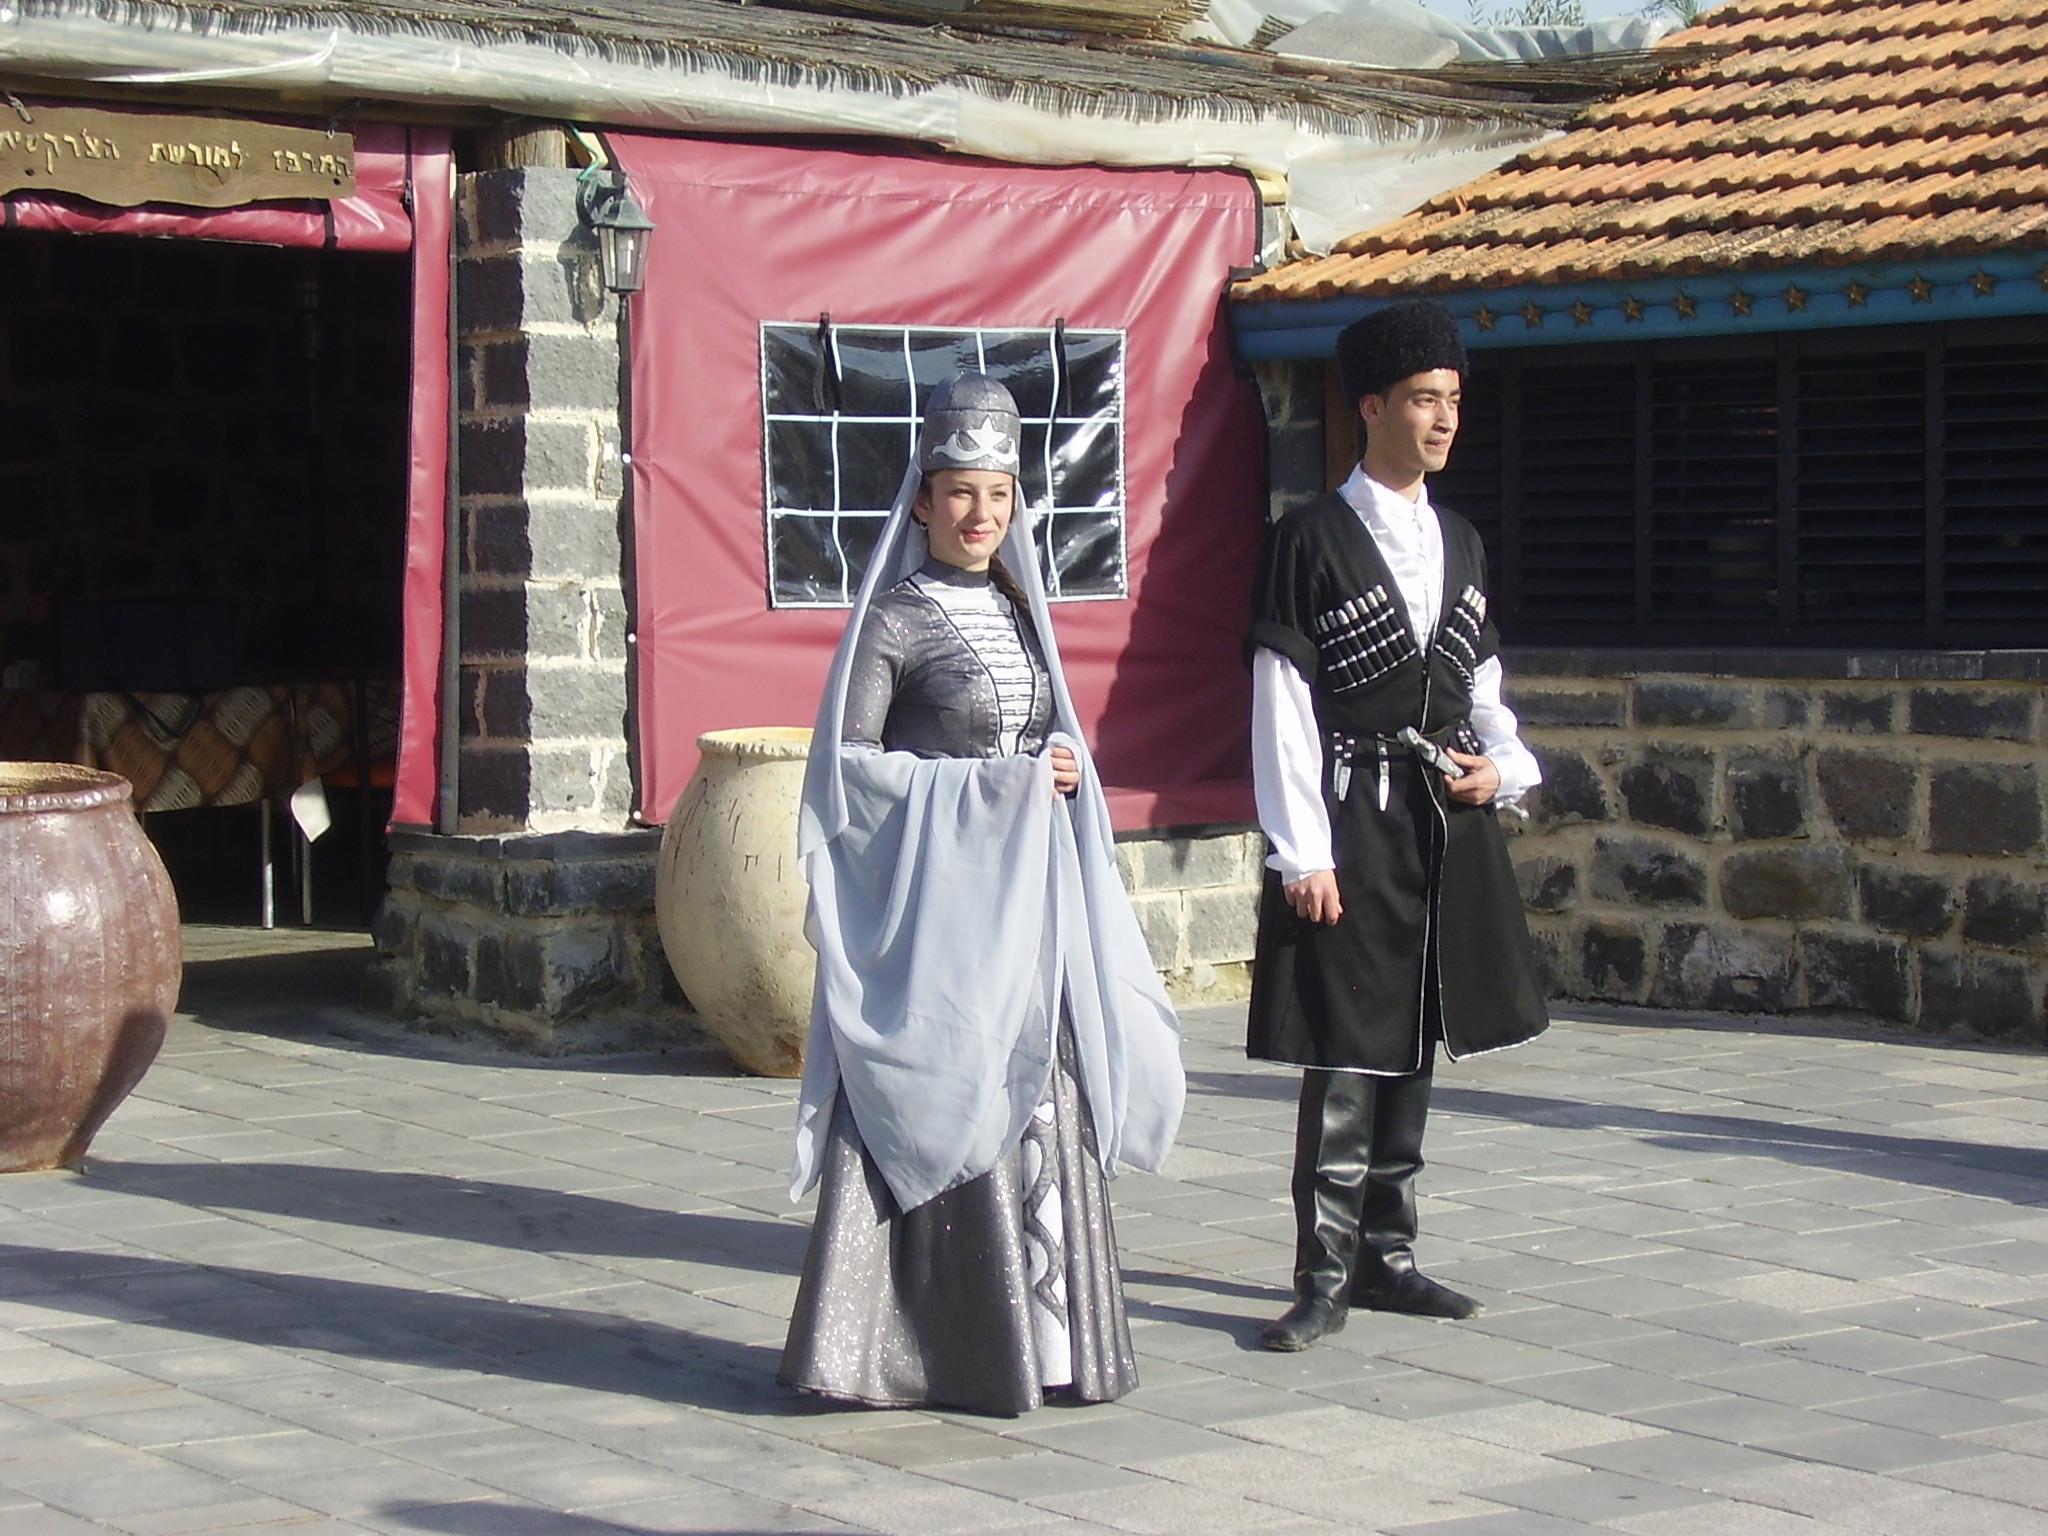 File:PikiWiki Israel 19131 Circassian dancers in Kafr Kama Israel.JPG